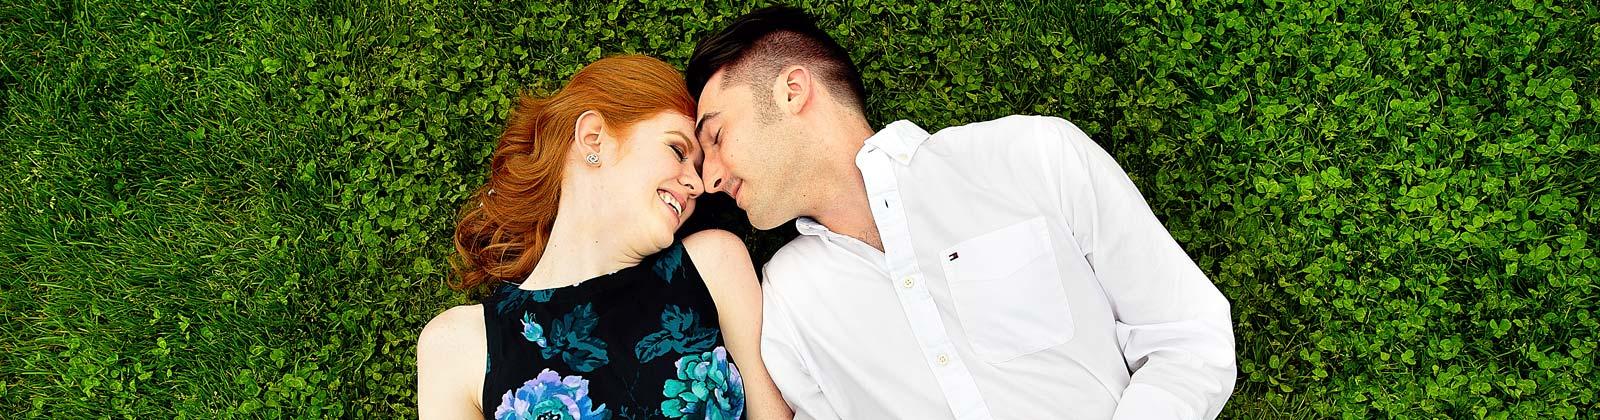 Best-Long-Island-Wedding-Photographers-Blog